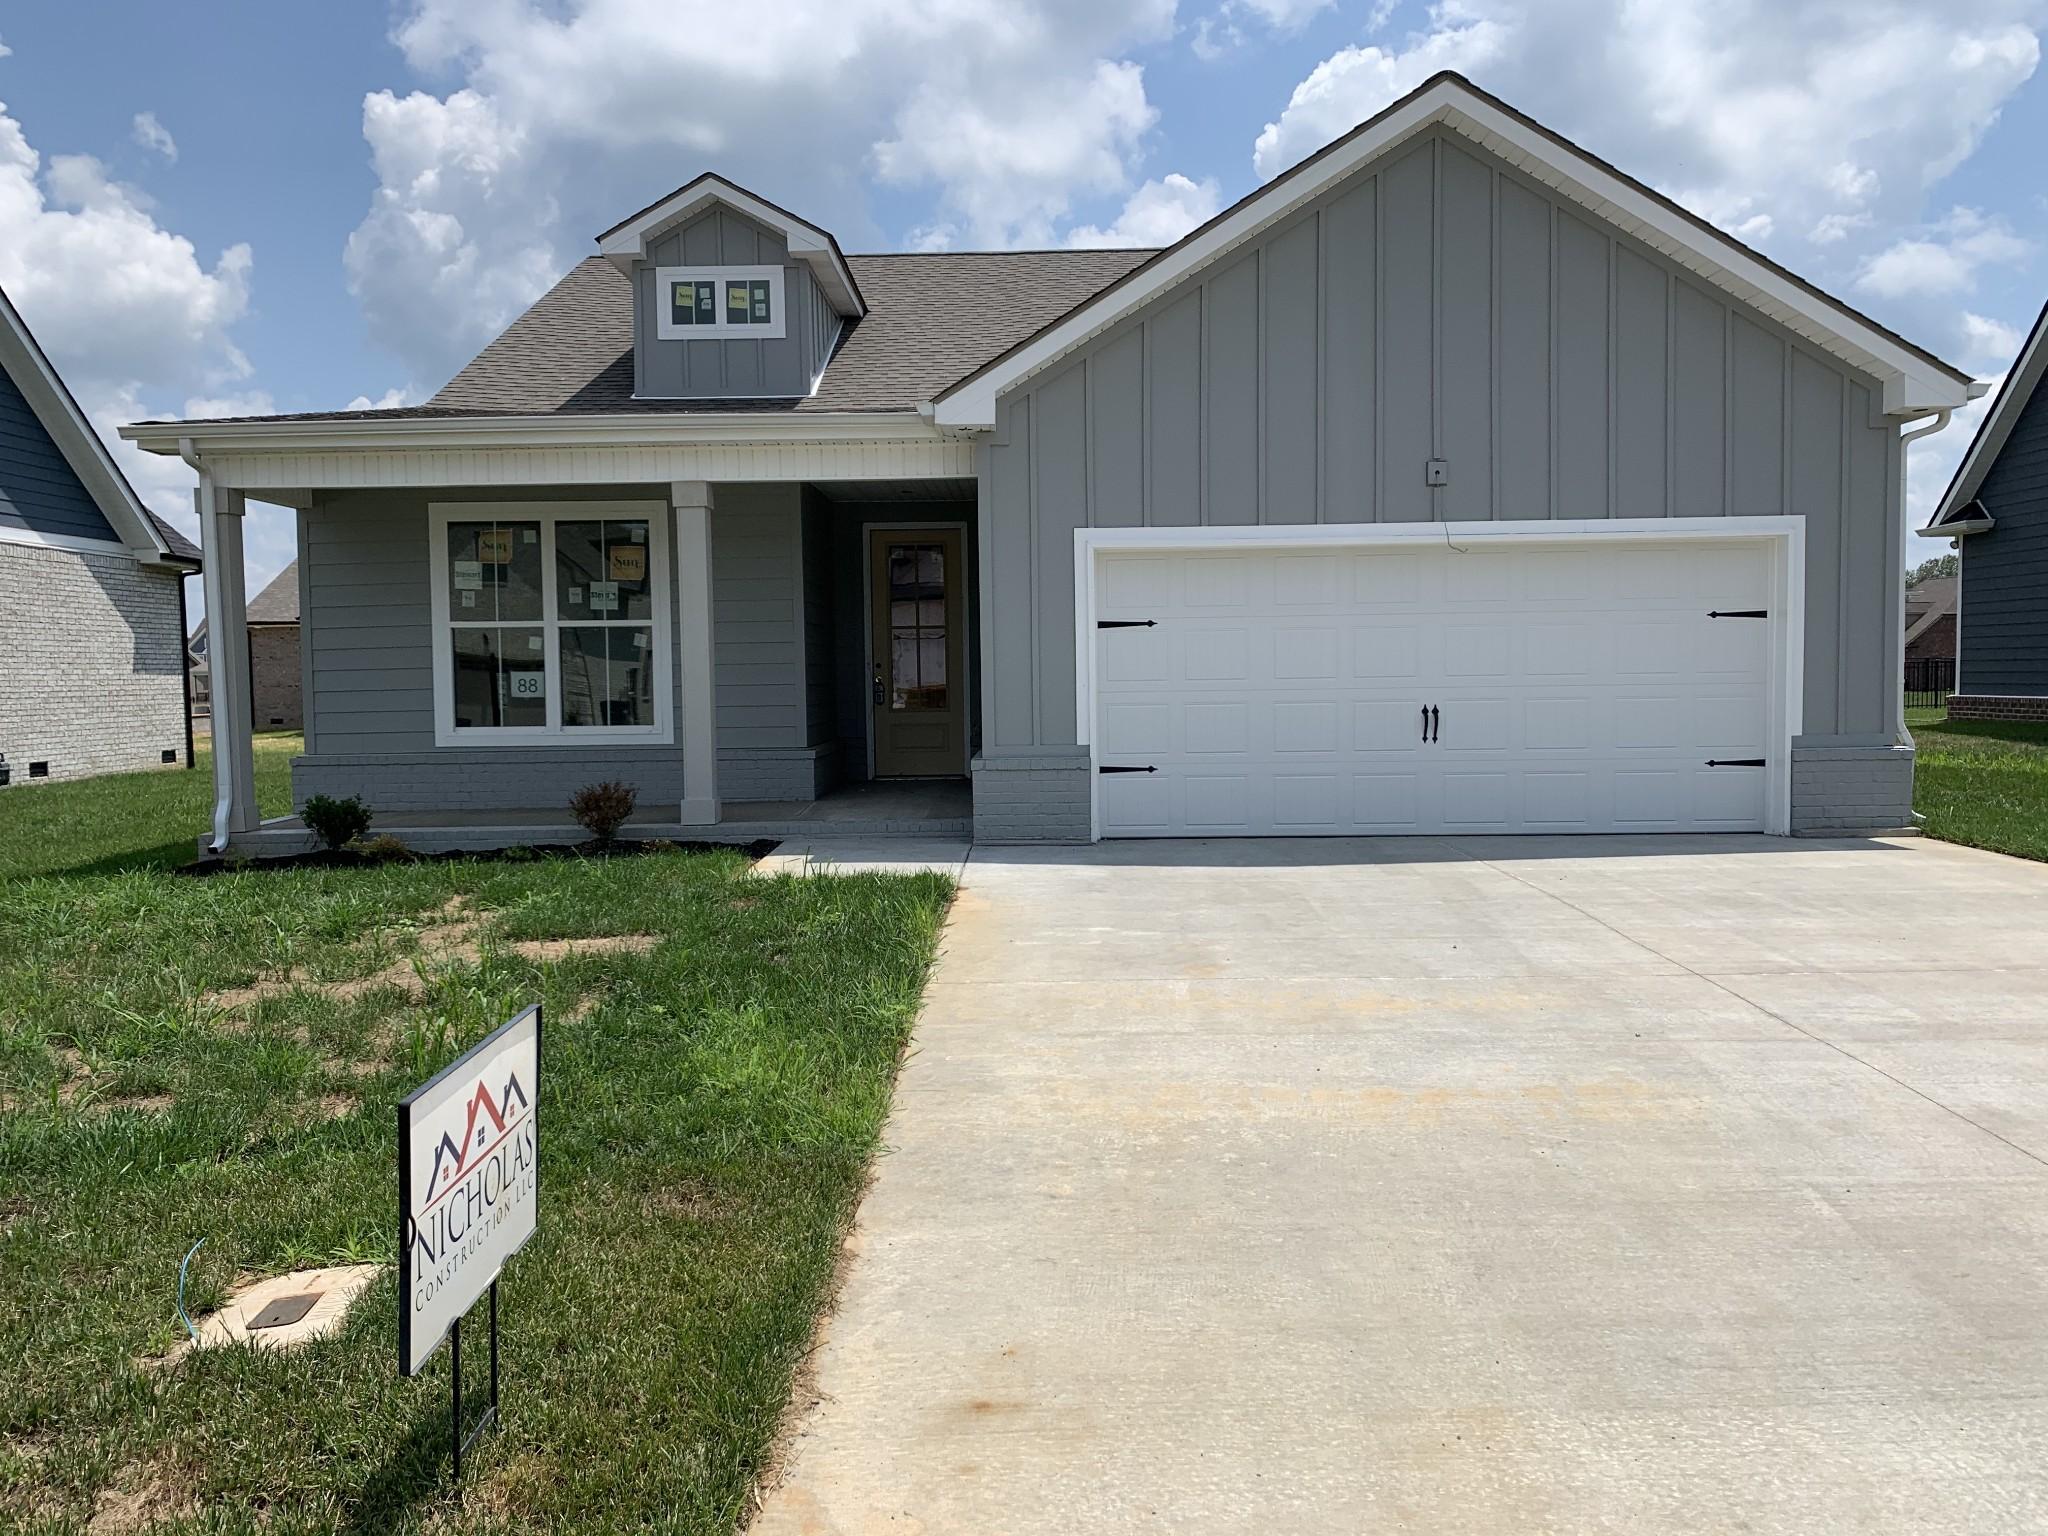 545 Dexter Drive Lot 88, Clarksville, TN 37043 - Clarksville, TN real estate listing